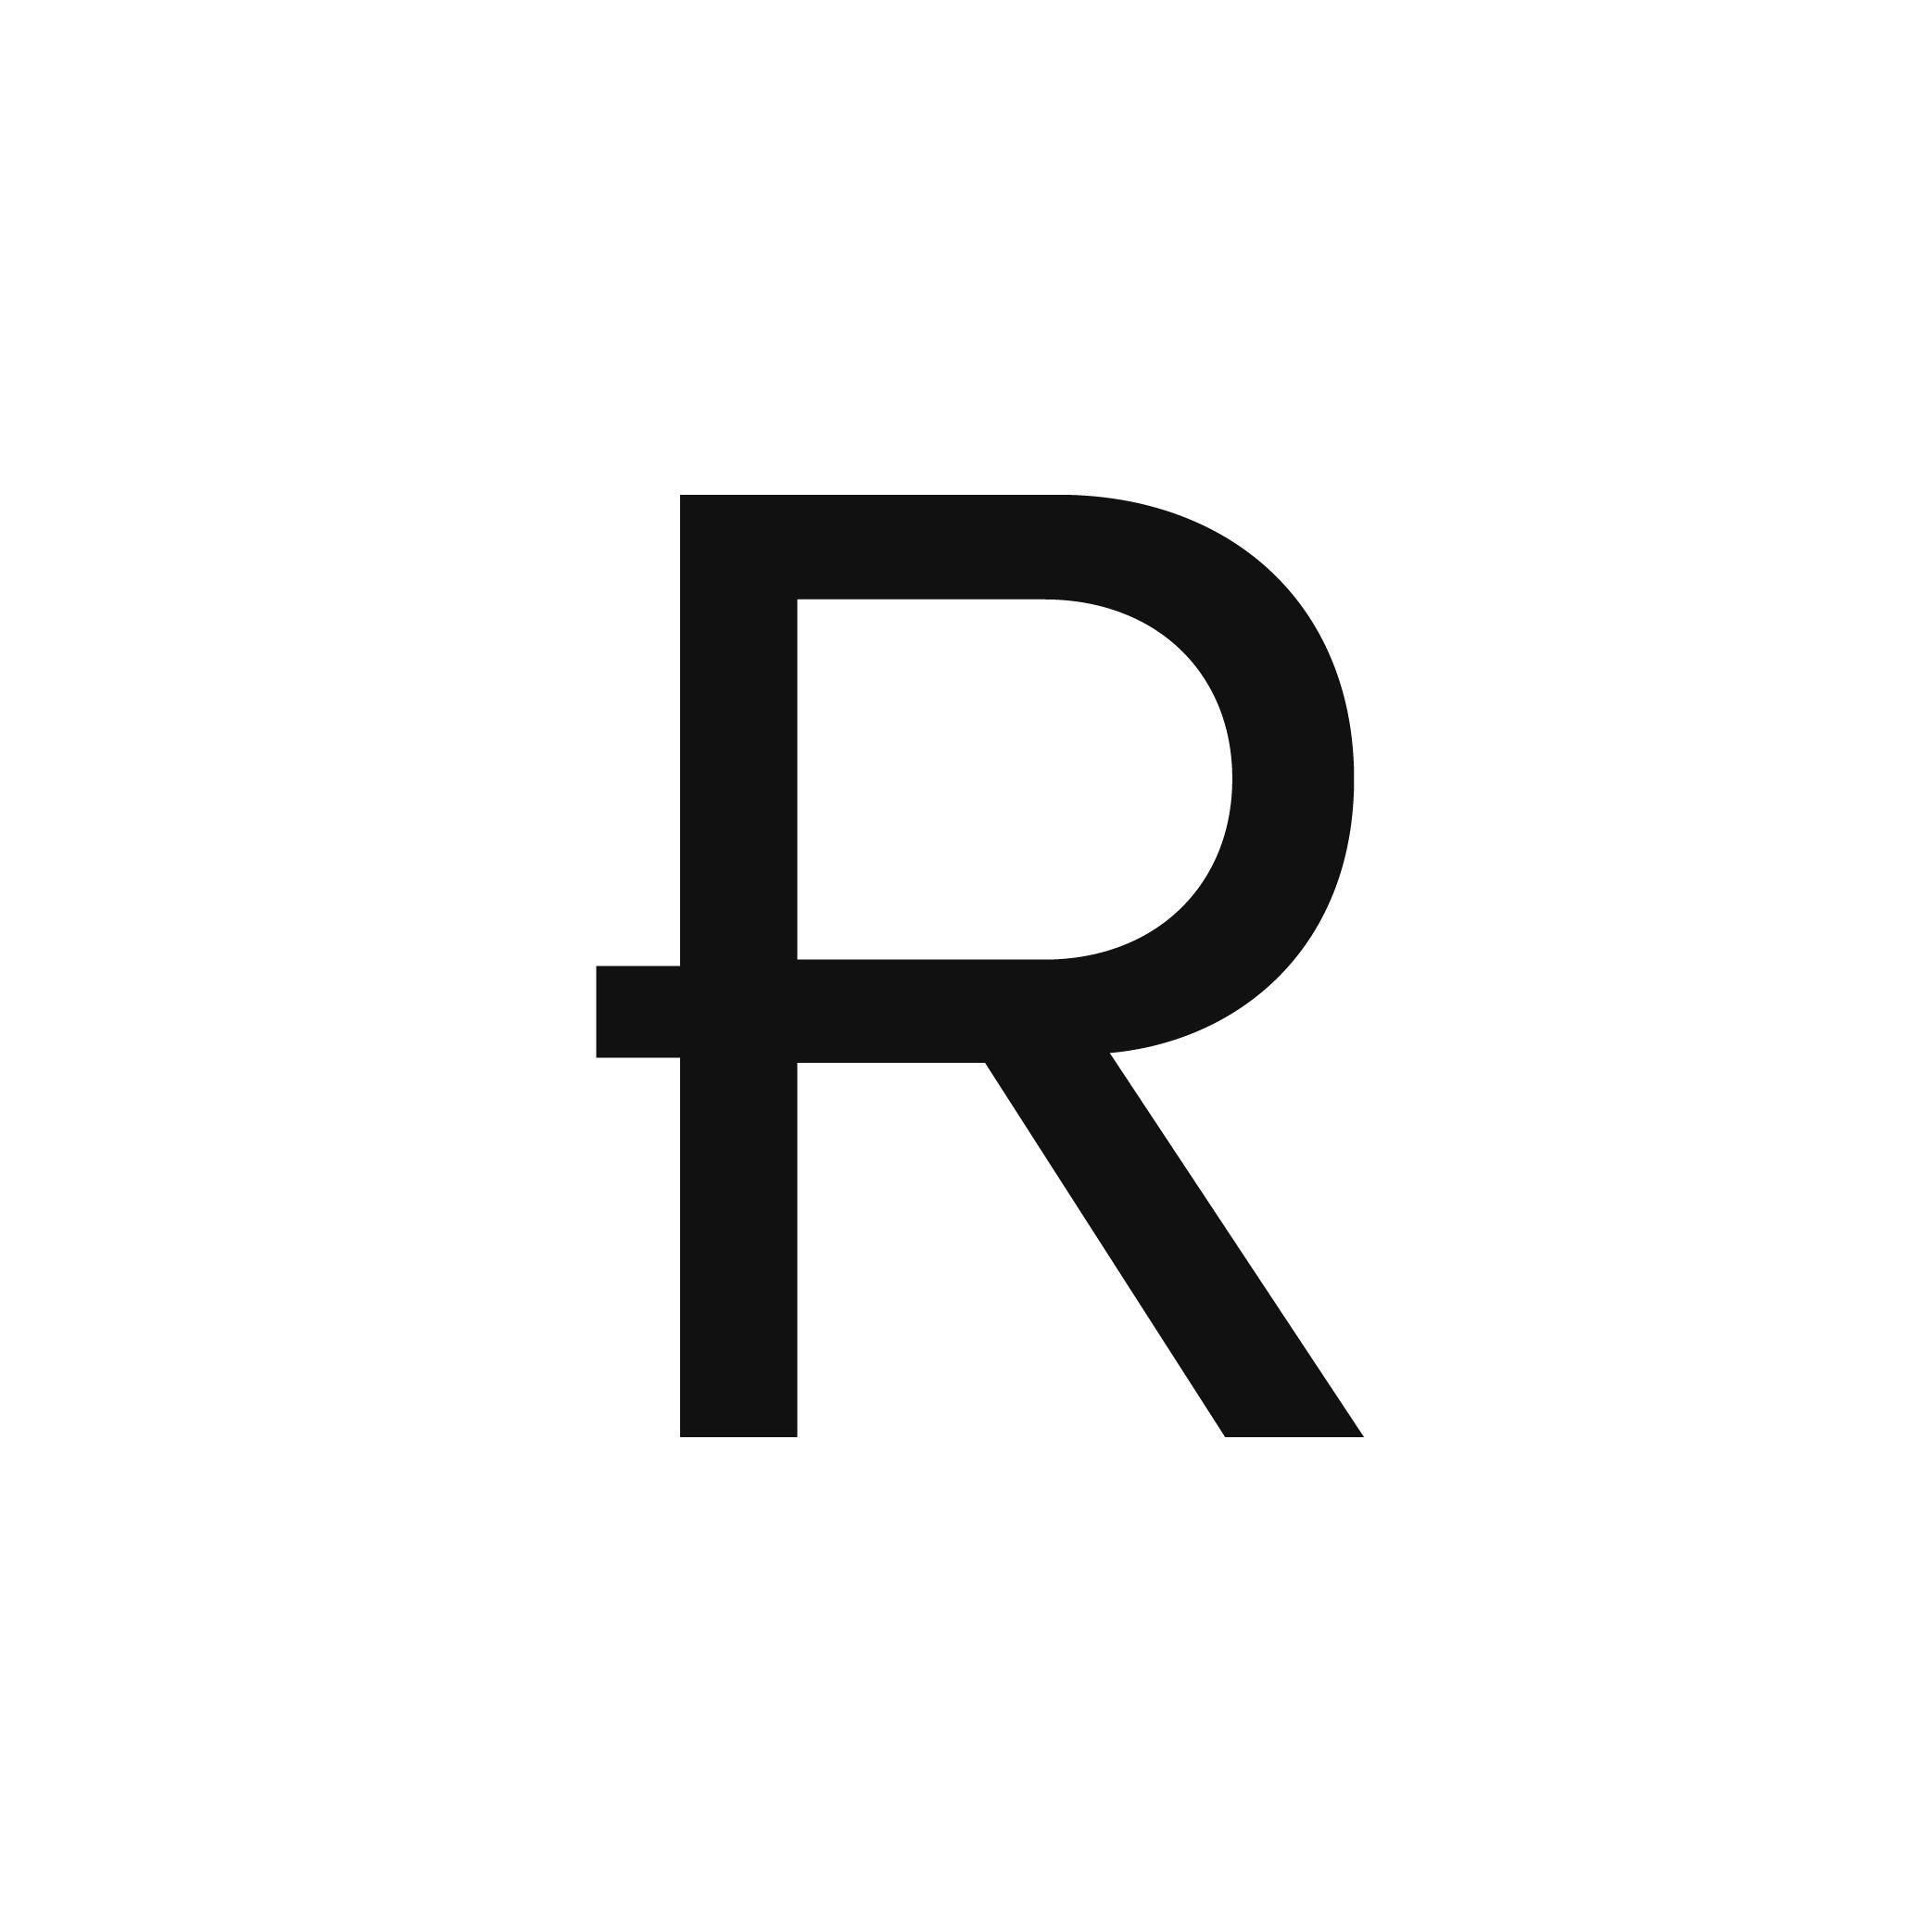 Avatar of user Rebfund